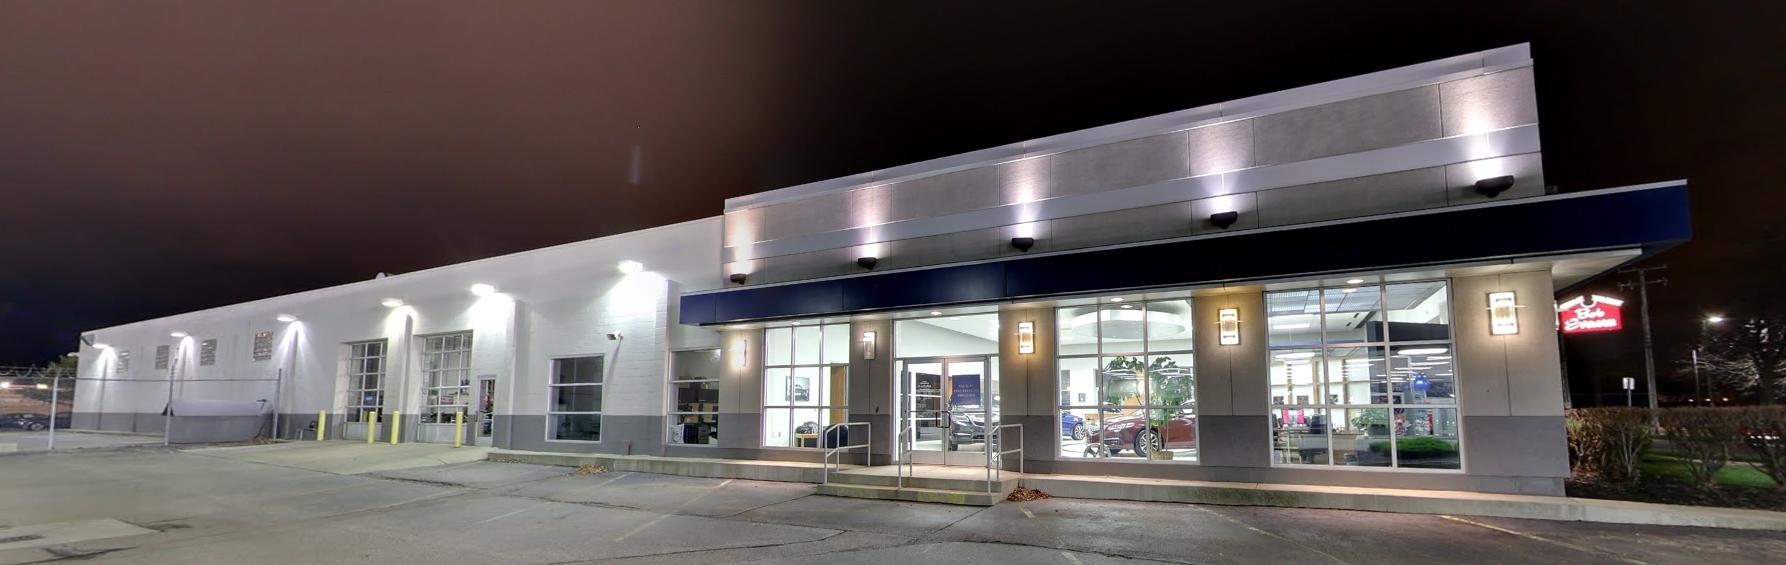 Used Car Dealers Roseville Michigan